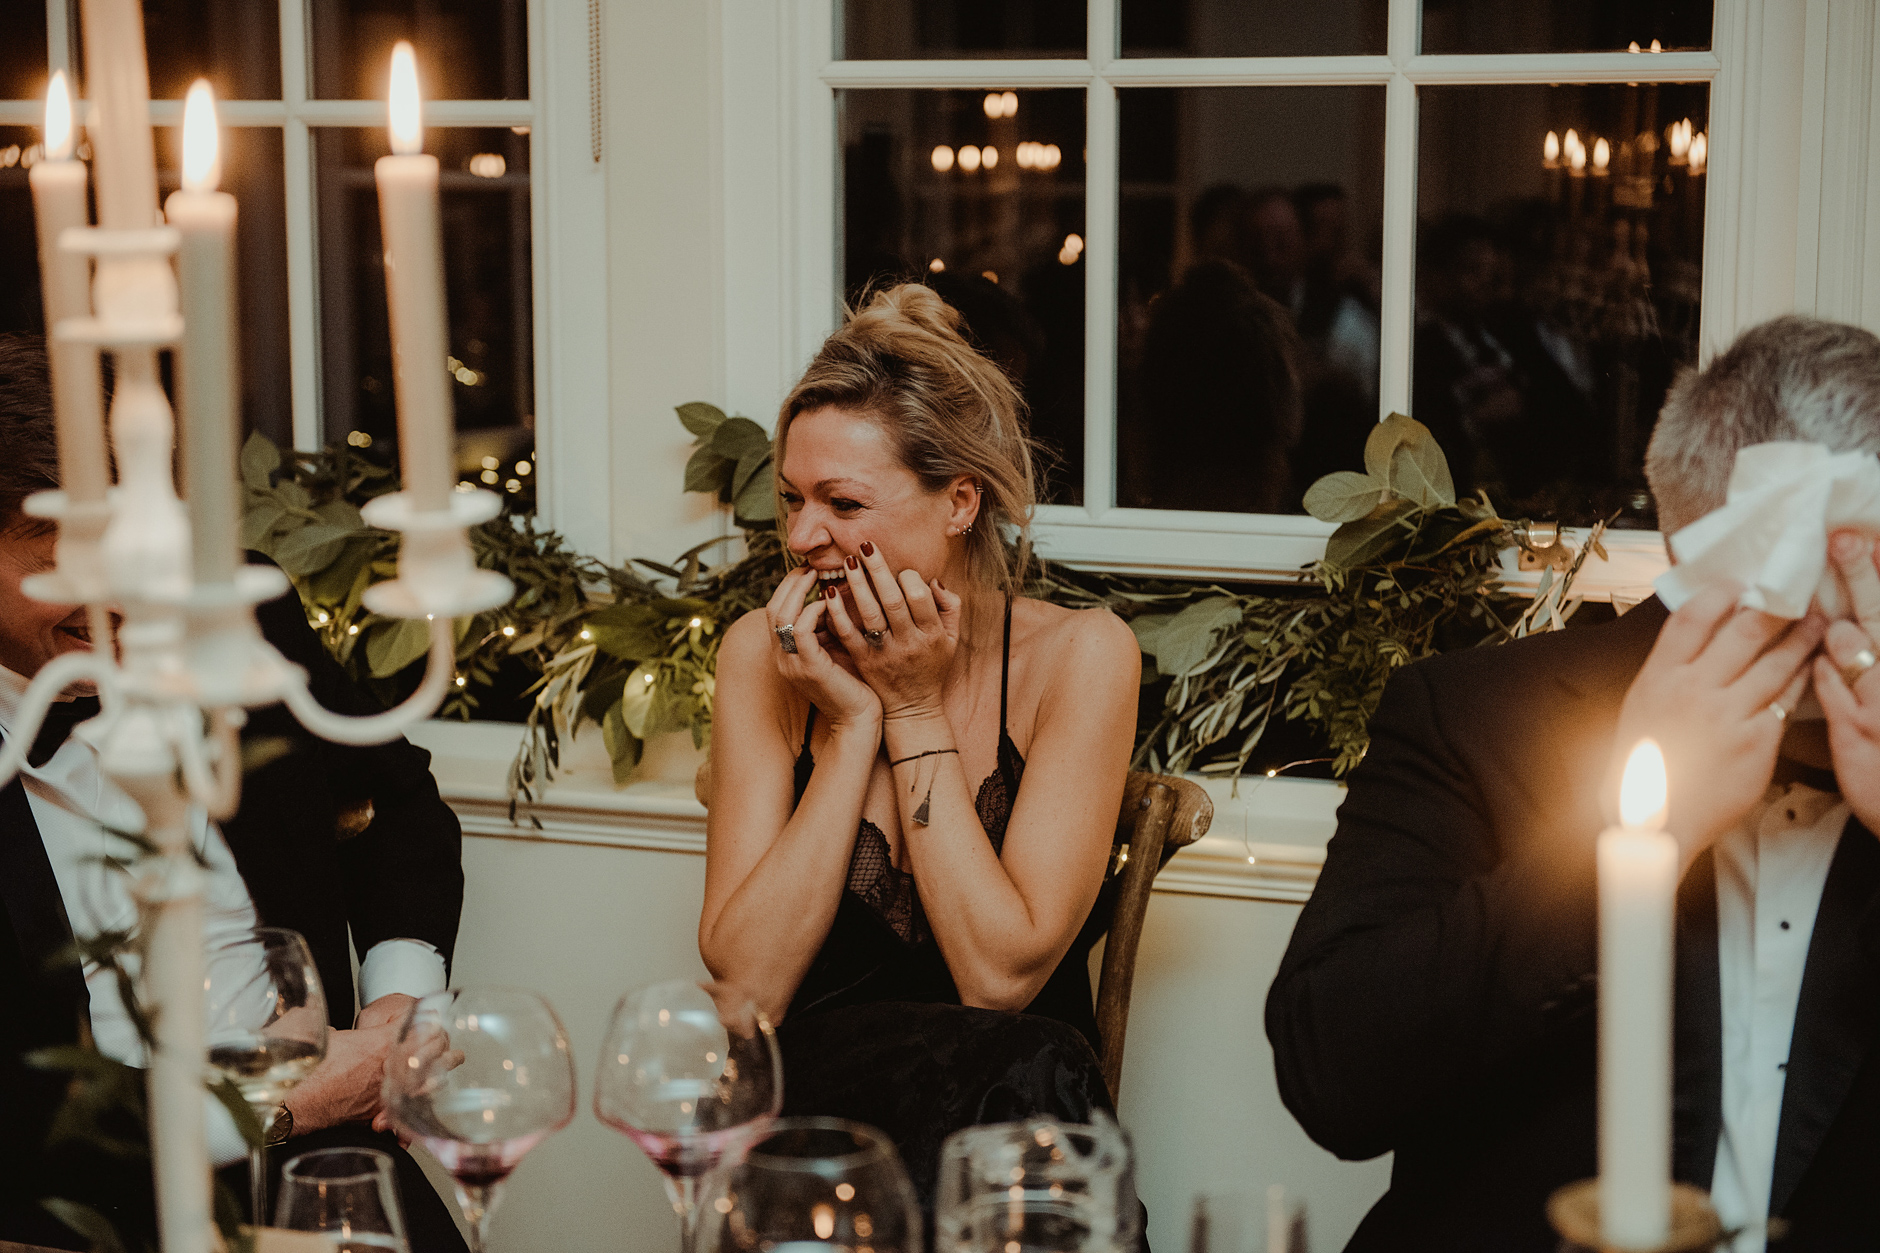 Glentruim-Wedding-Nikki-Leadbetter-Photography-325.jpg